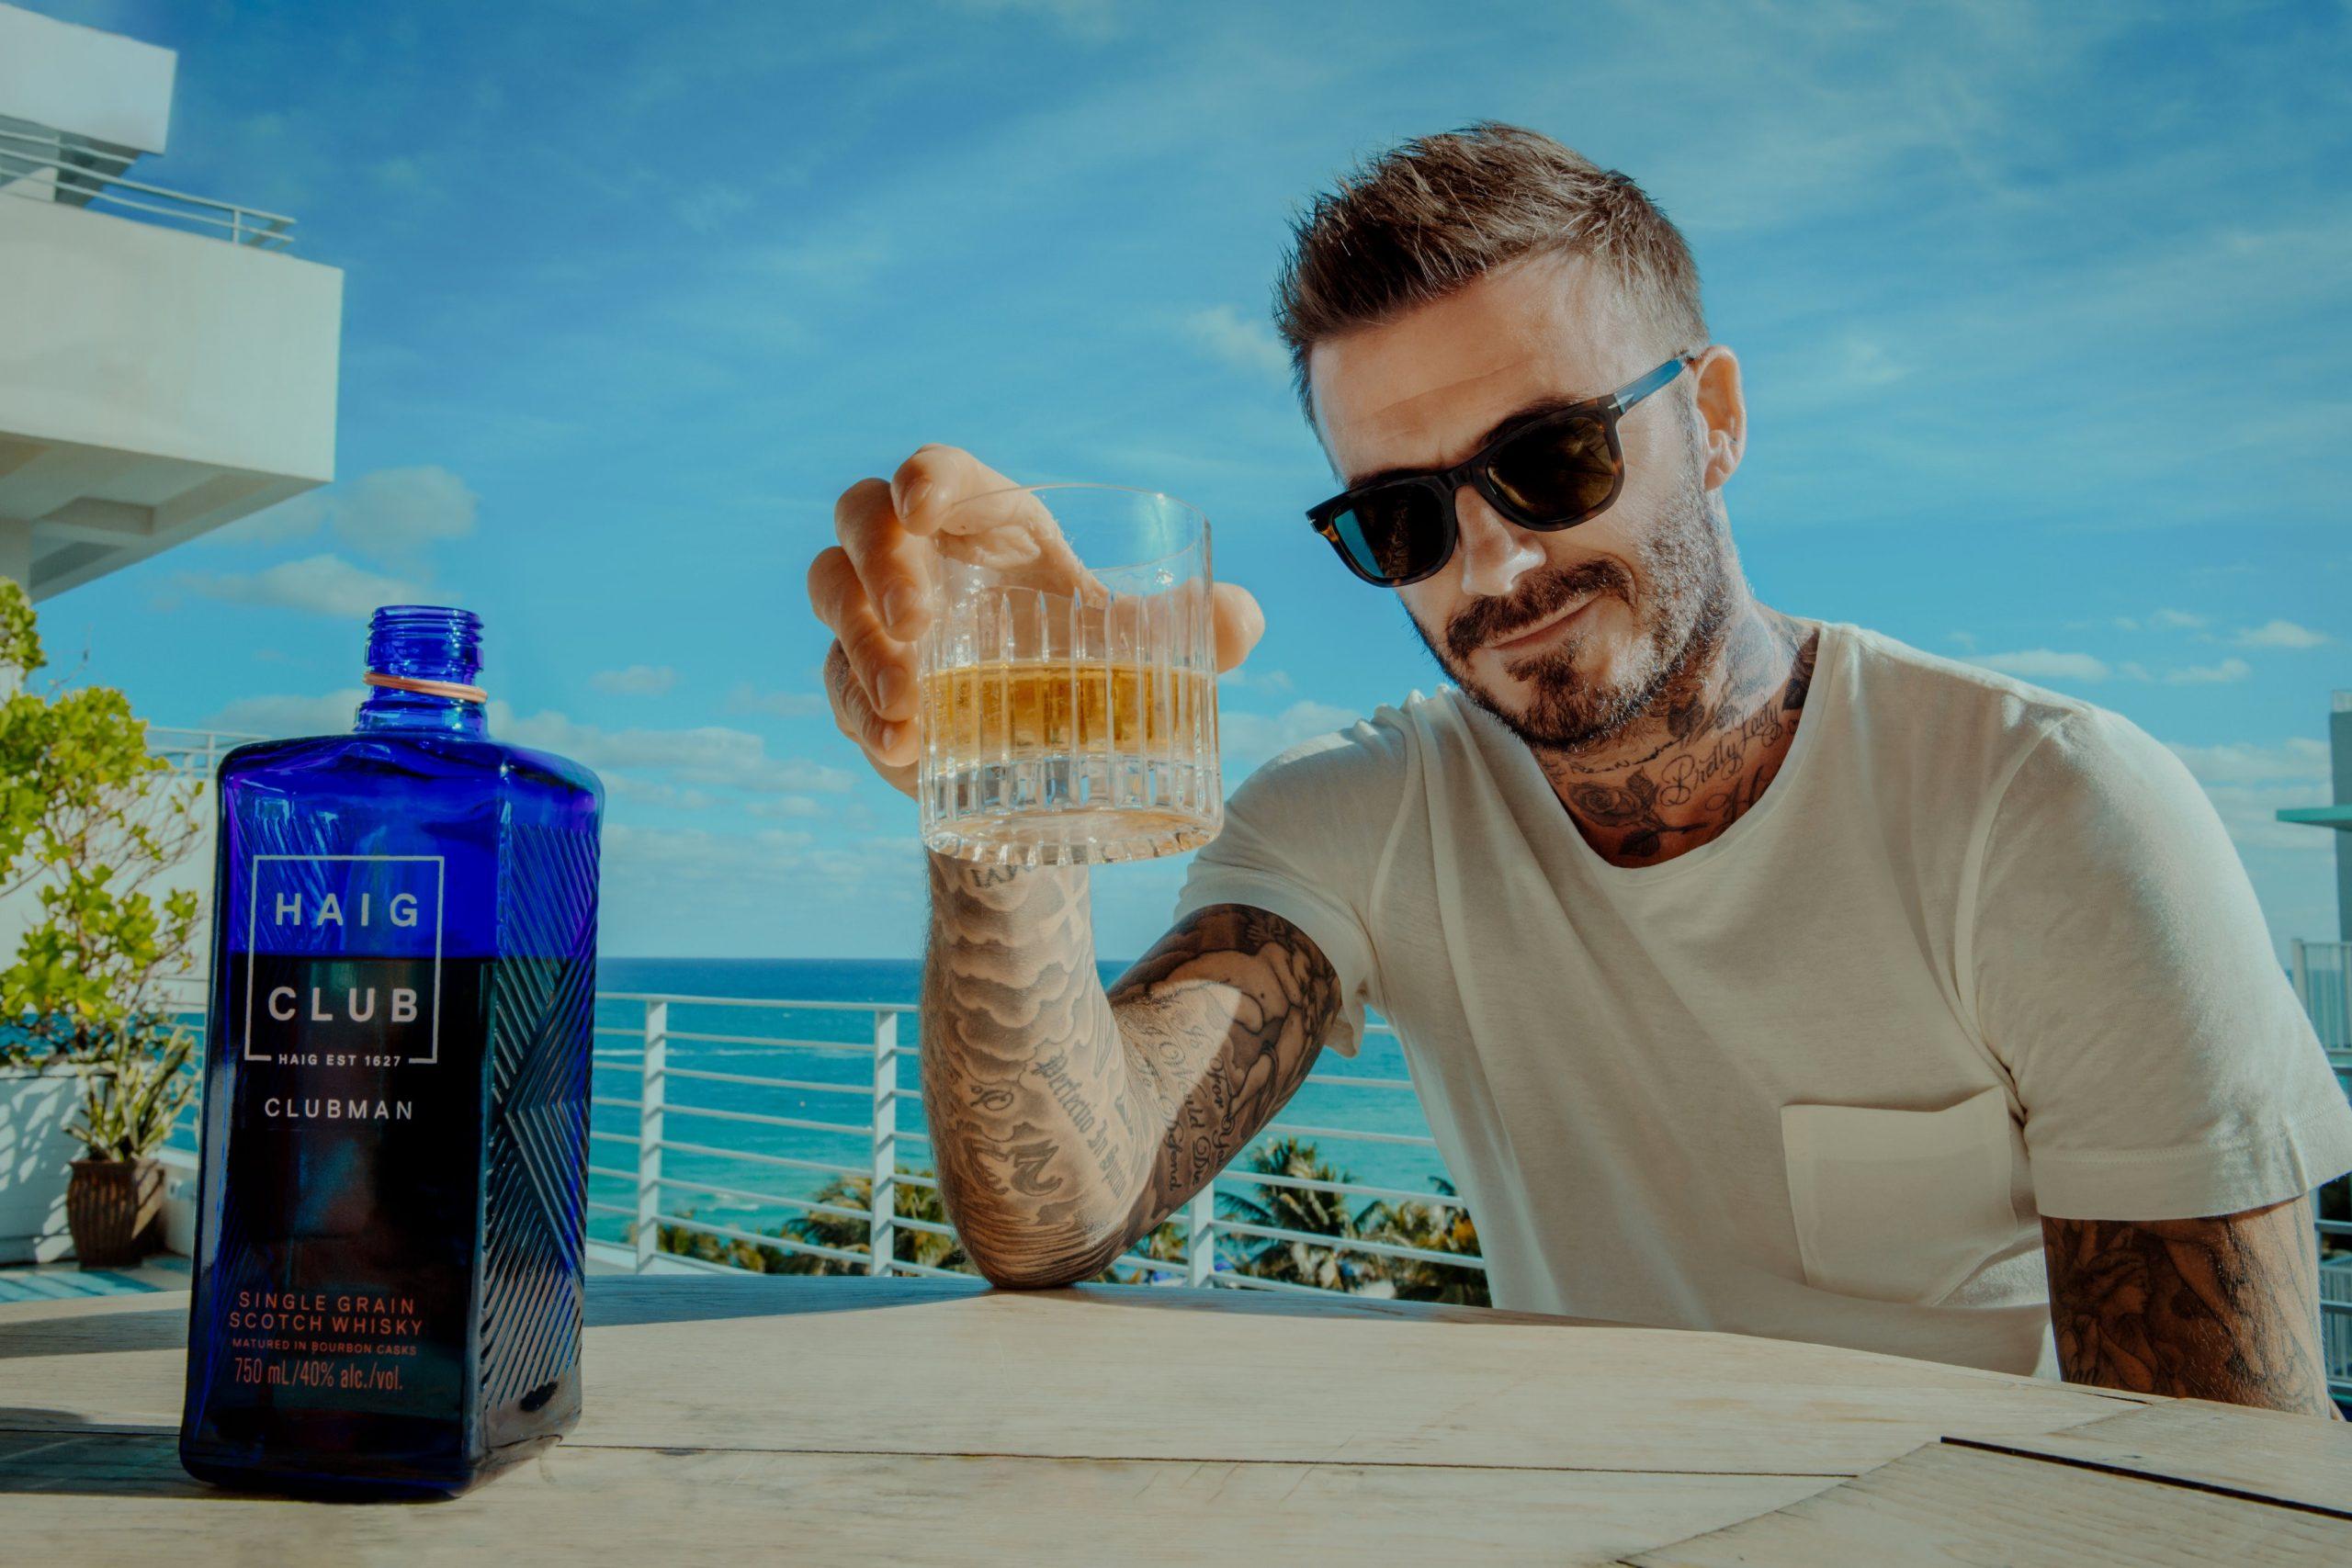 David Beckham's Favorite Miami Restaurants, New Whiskey, And First Inter Miami Cf Home Game photo